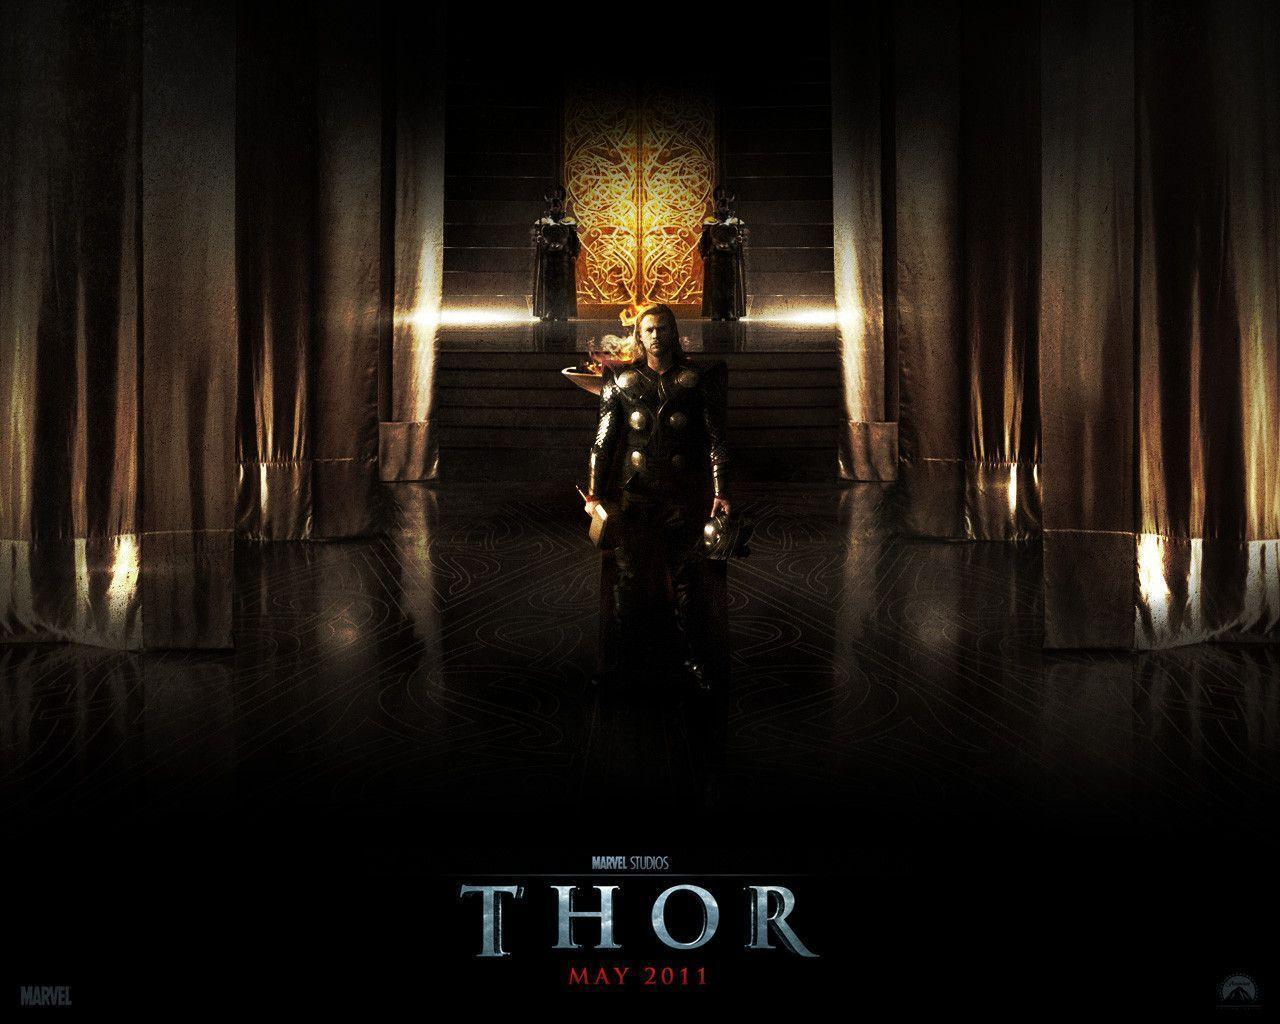 Image - Thor wallpaper 1280x1024 12.jpg - Marvel Movies Wiki ...